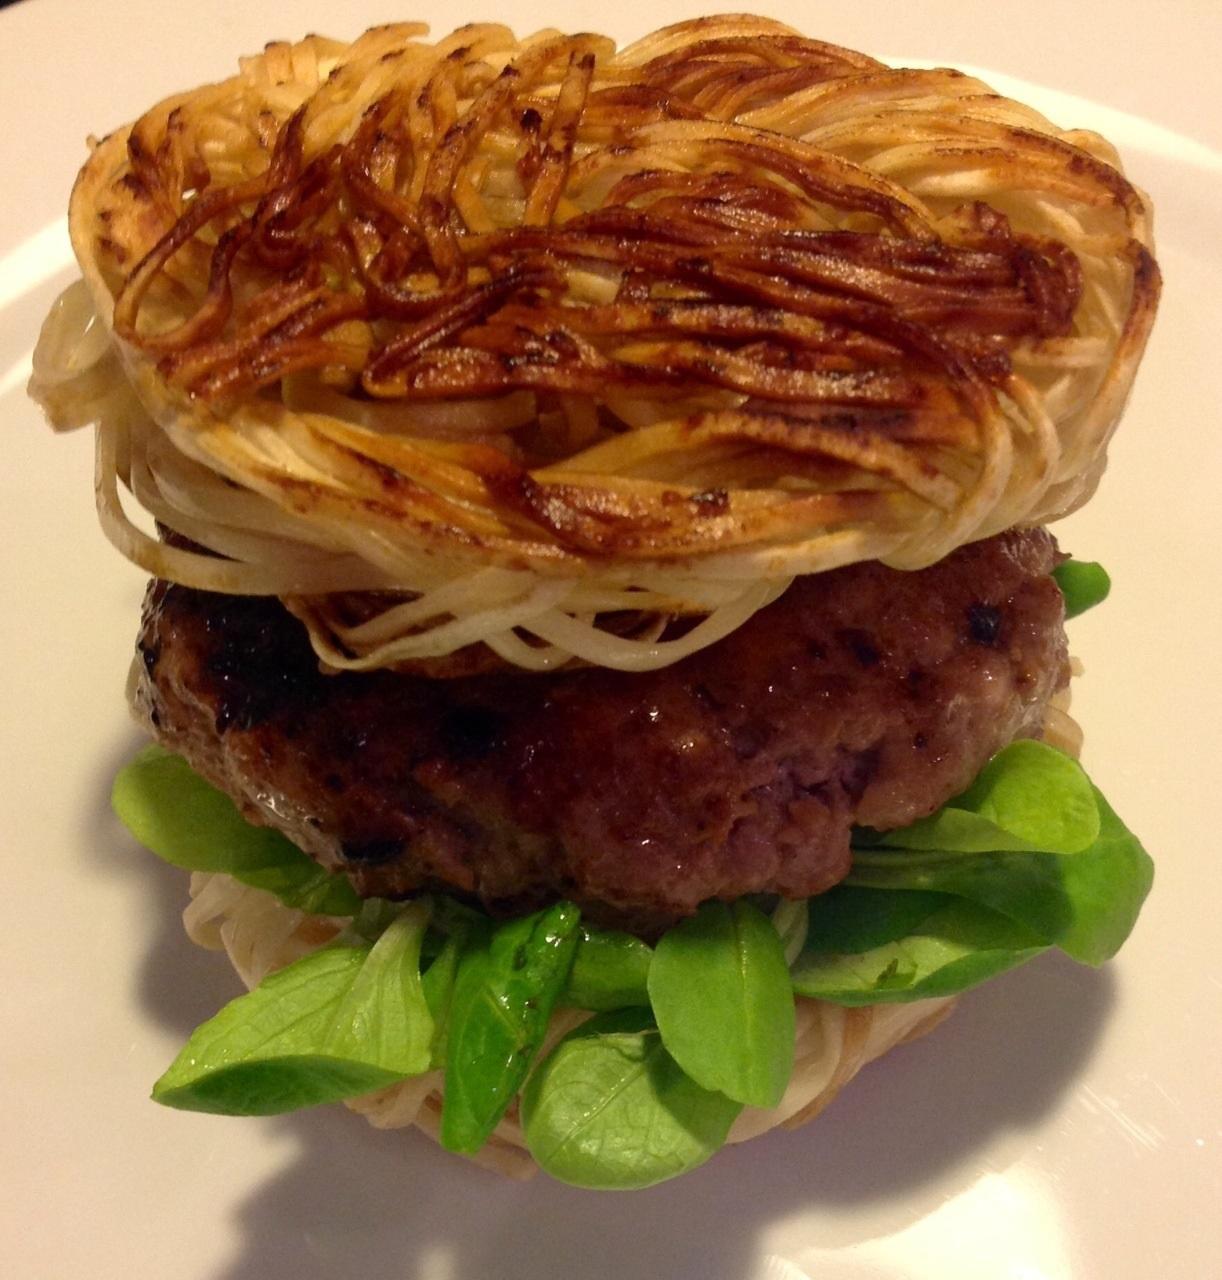 Ramen burger by Lea HoggRamen burger by Lea Hogg